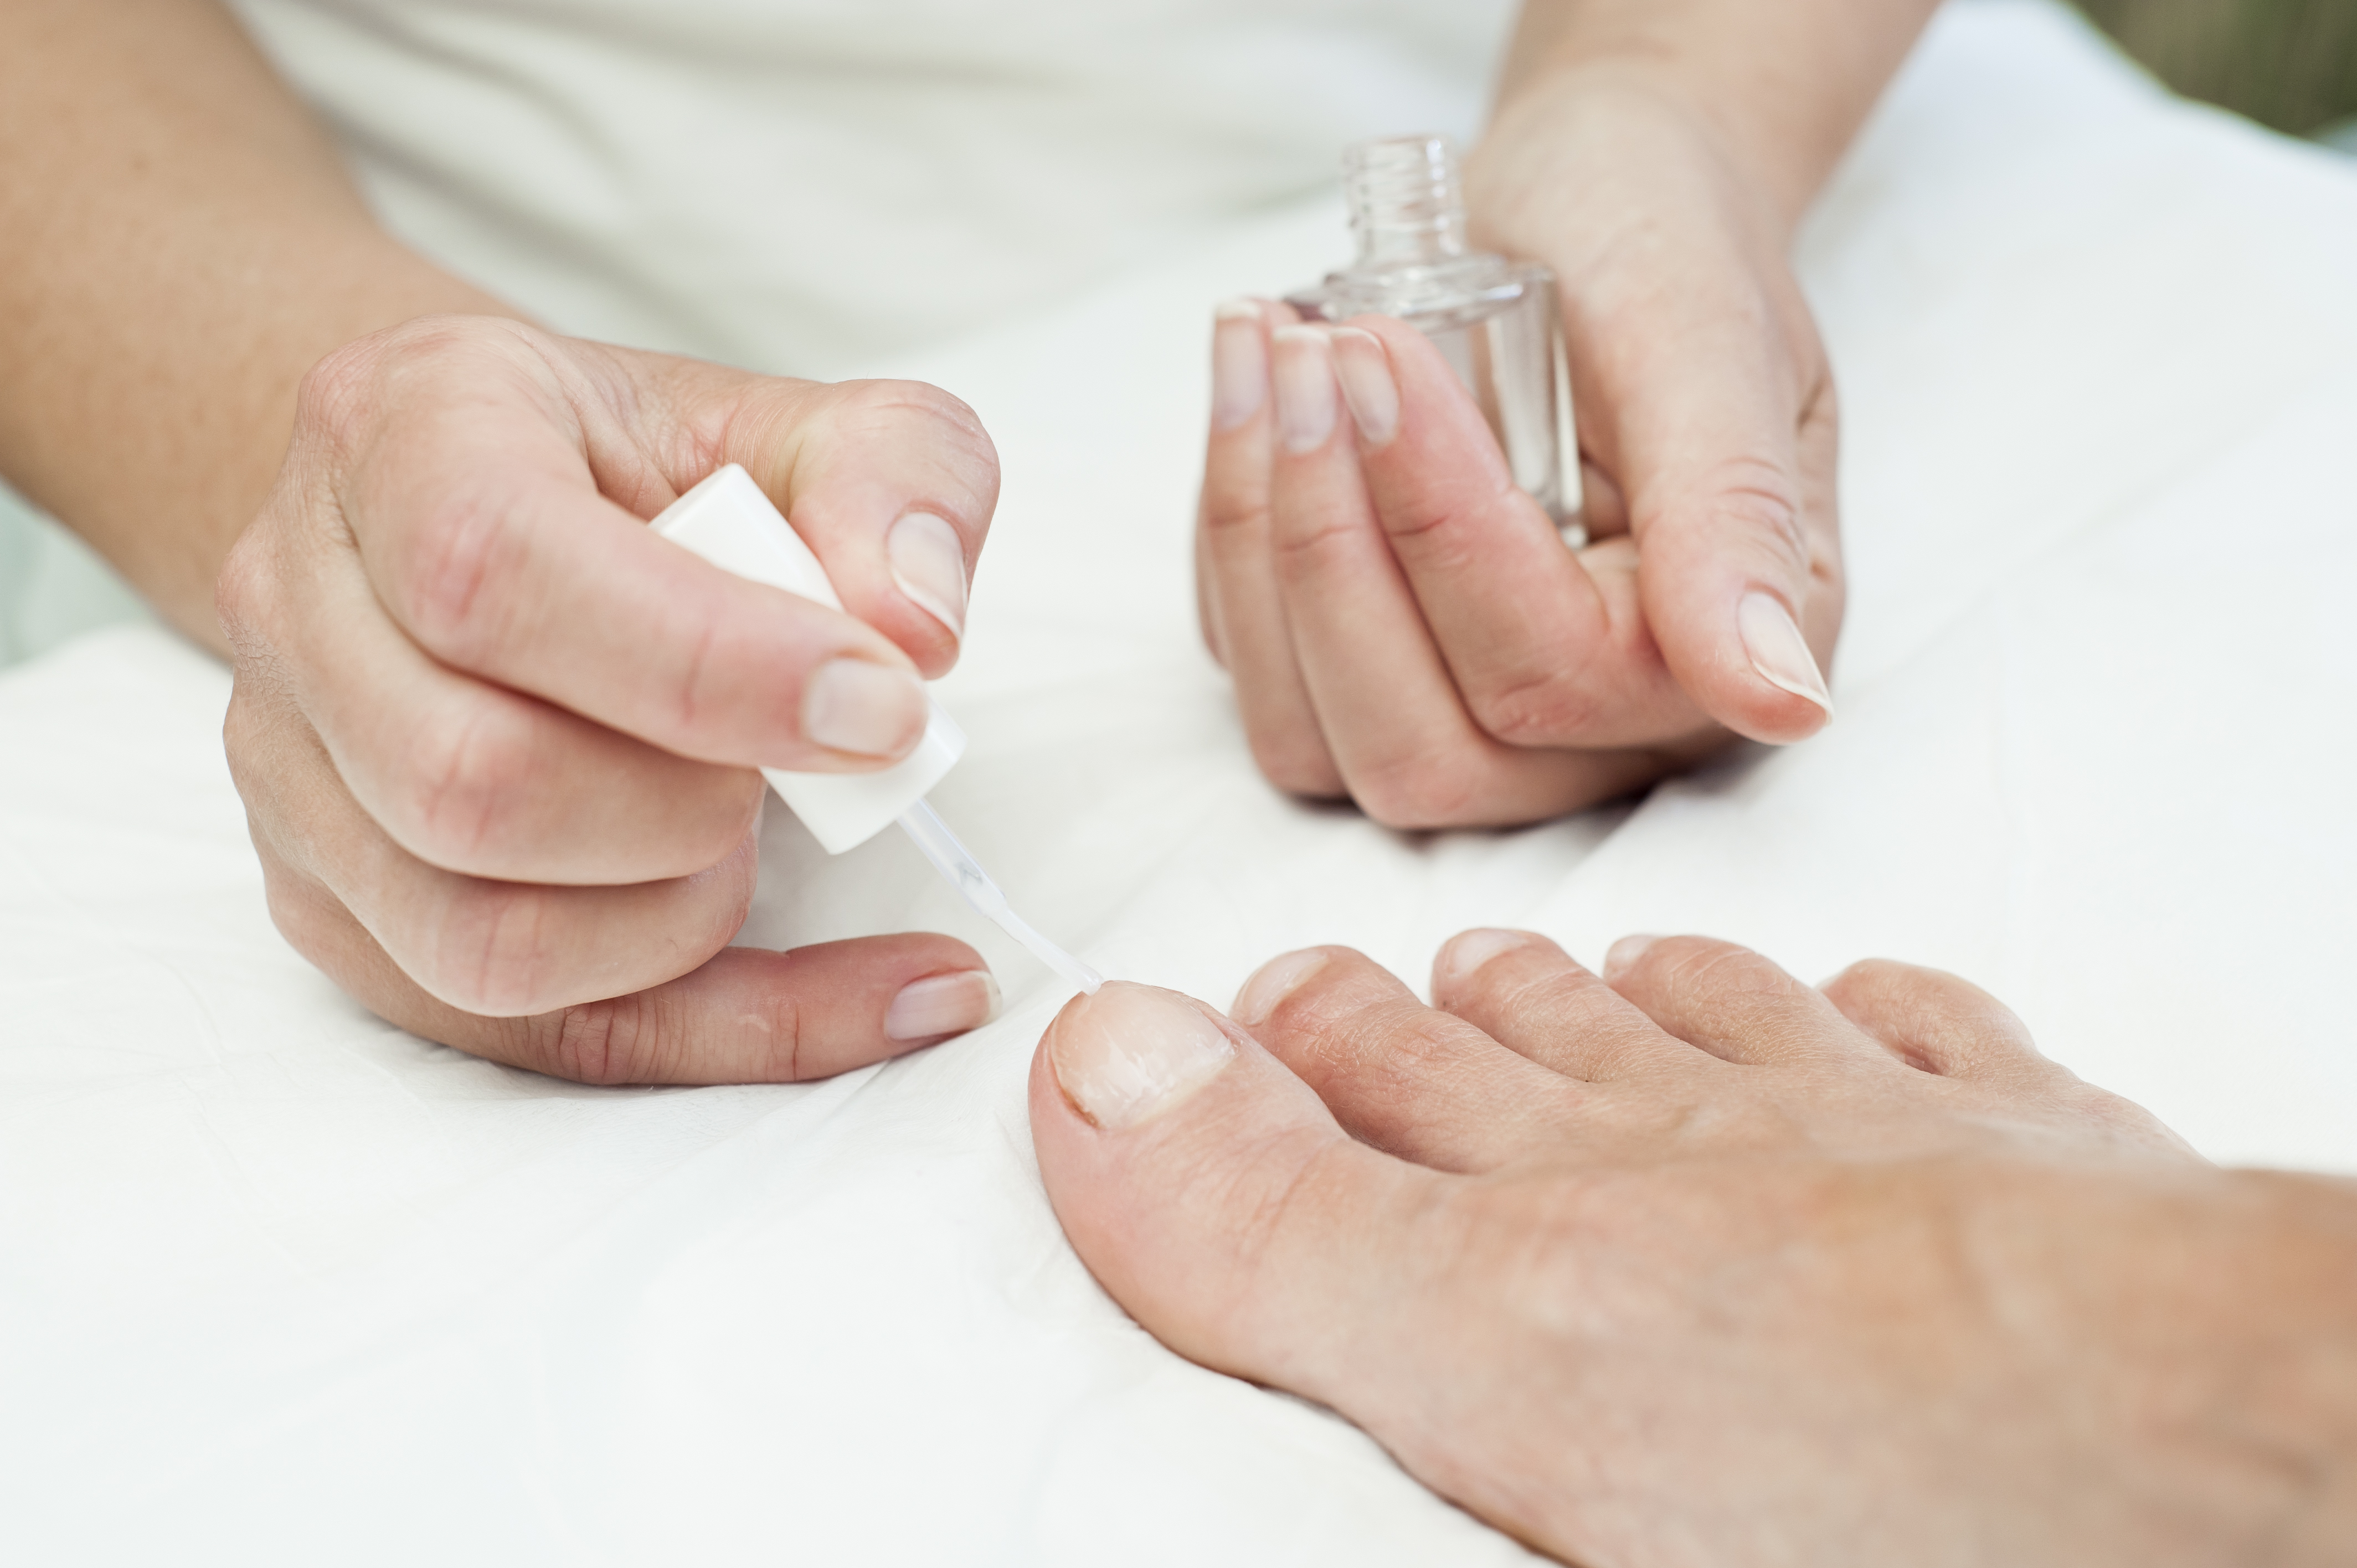 manicure Orion rua indico